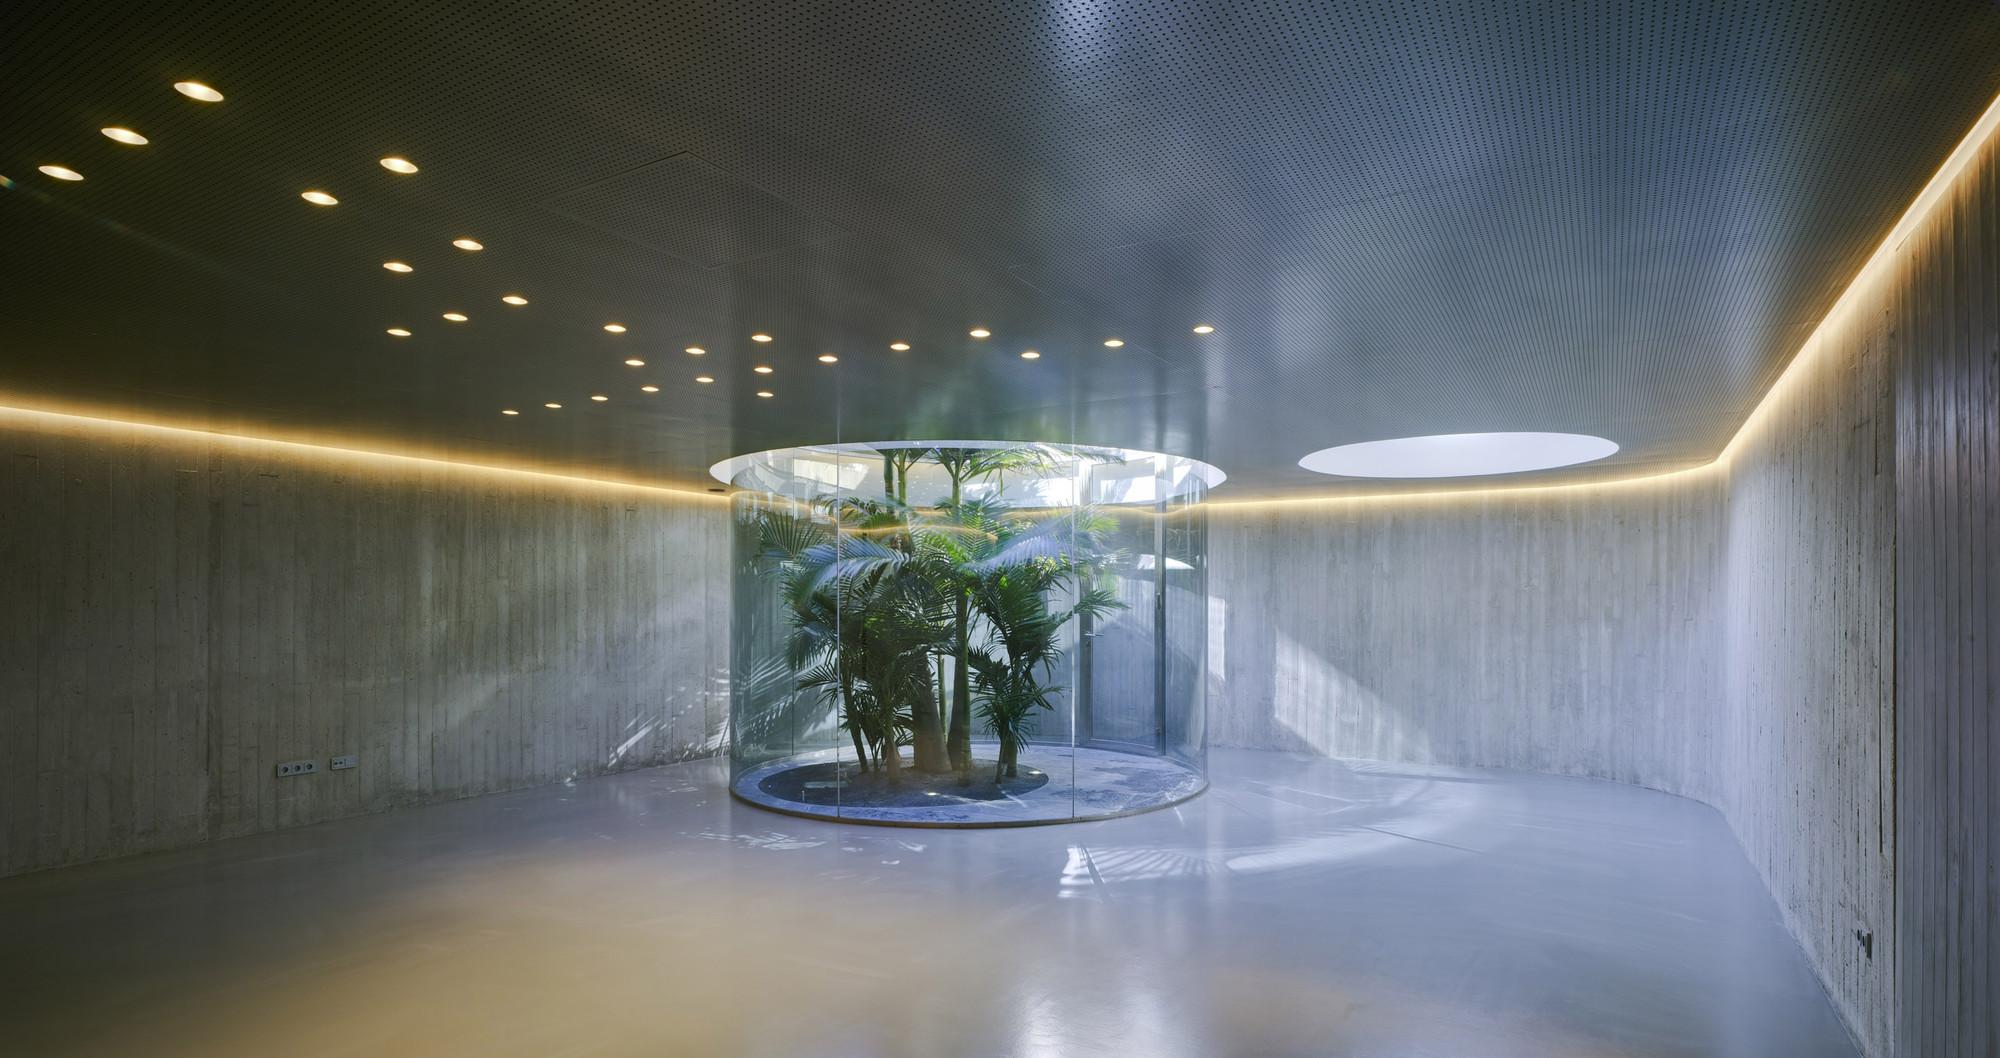 4 in 1 house clavel arquitectos archdaily - Clavel arquitectos ...